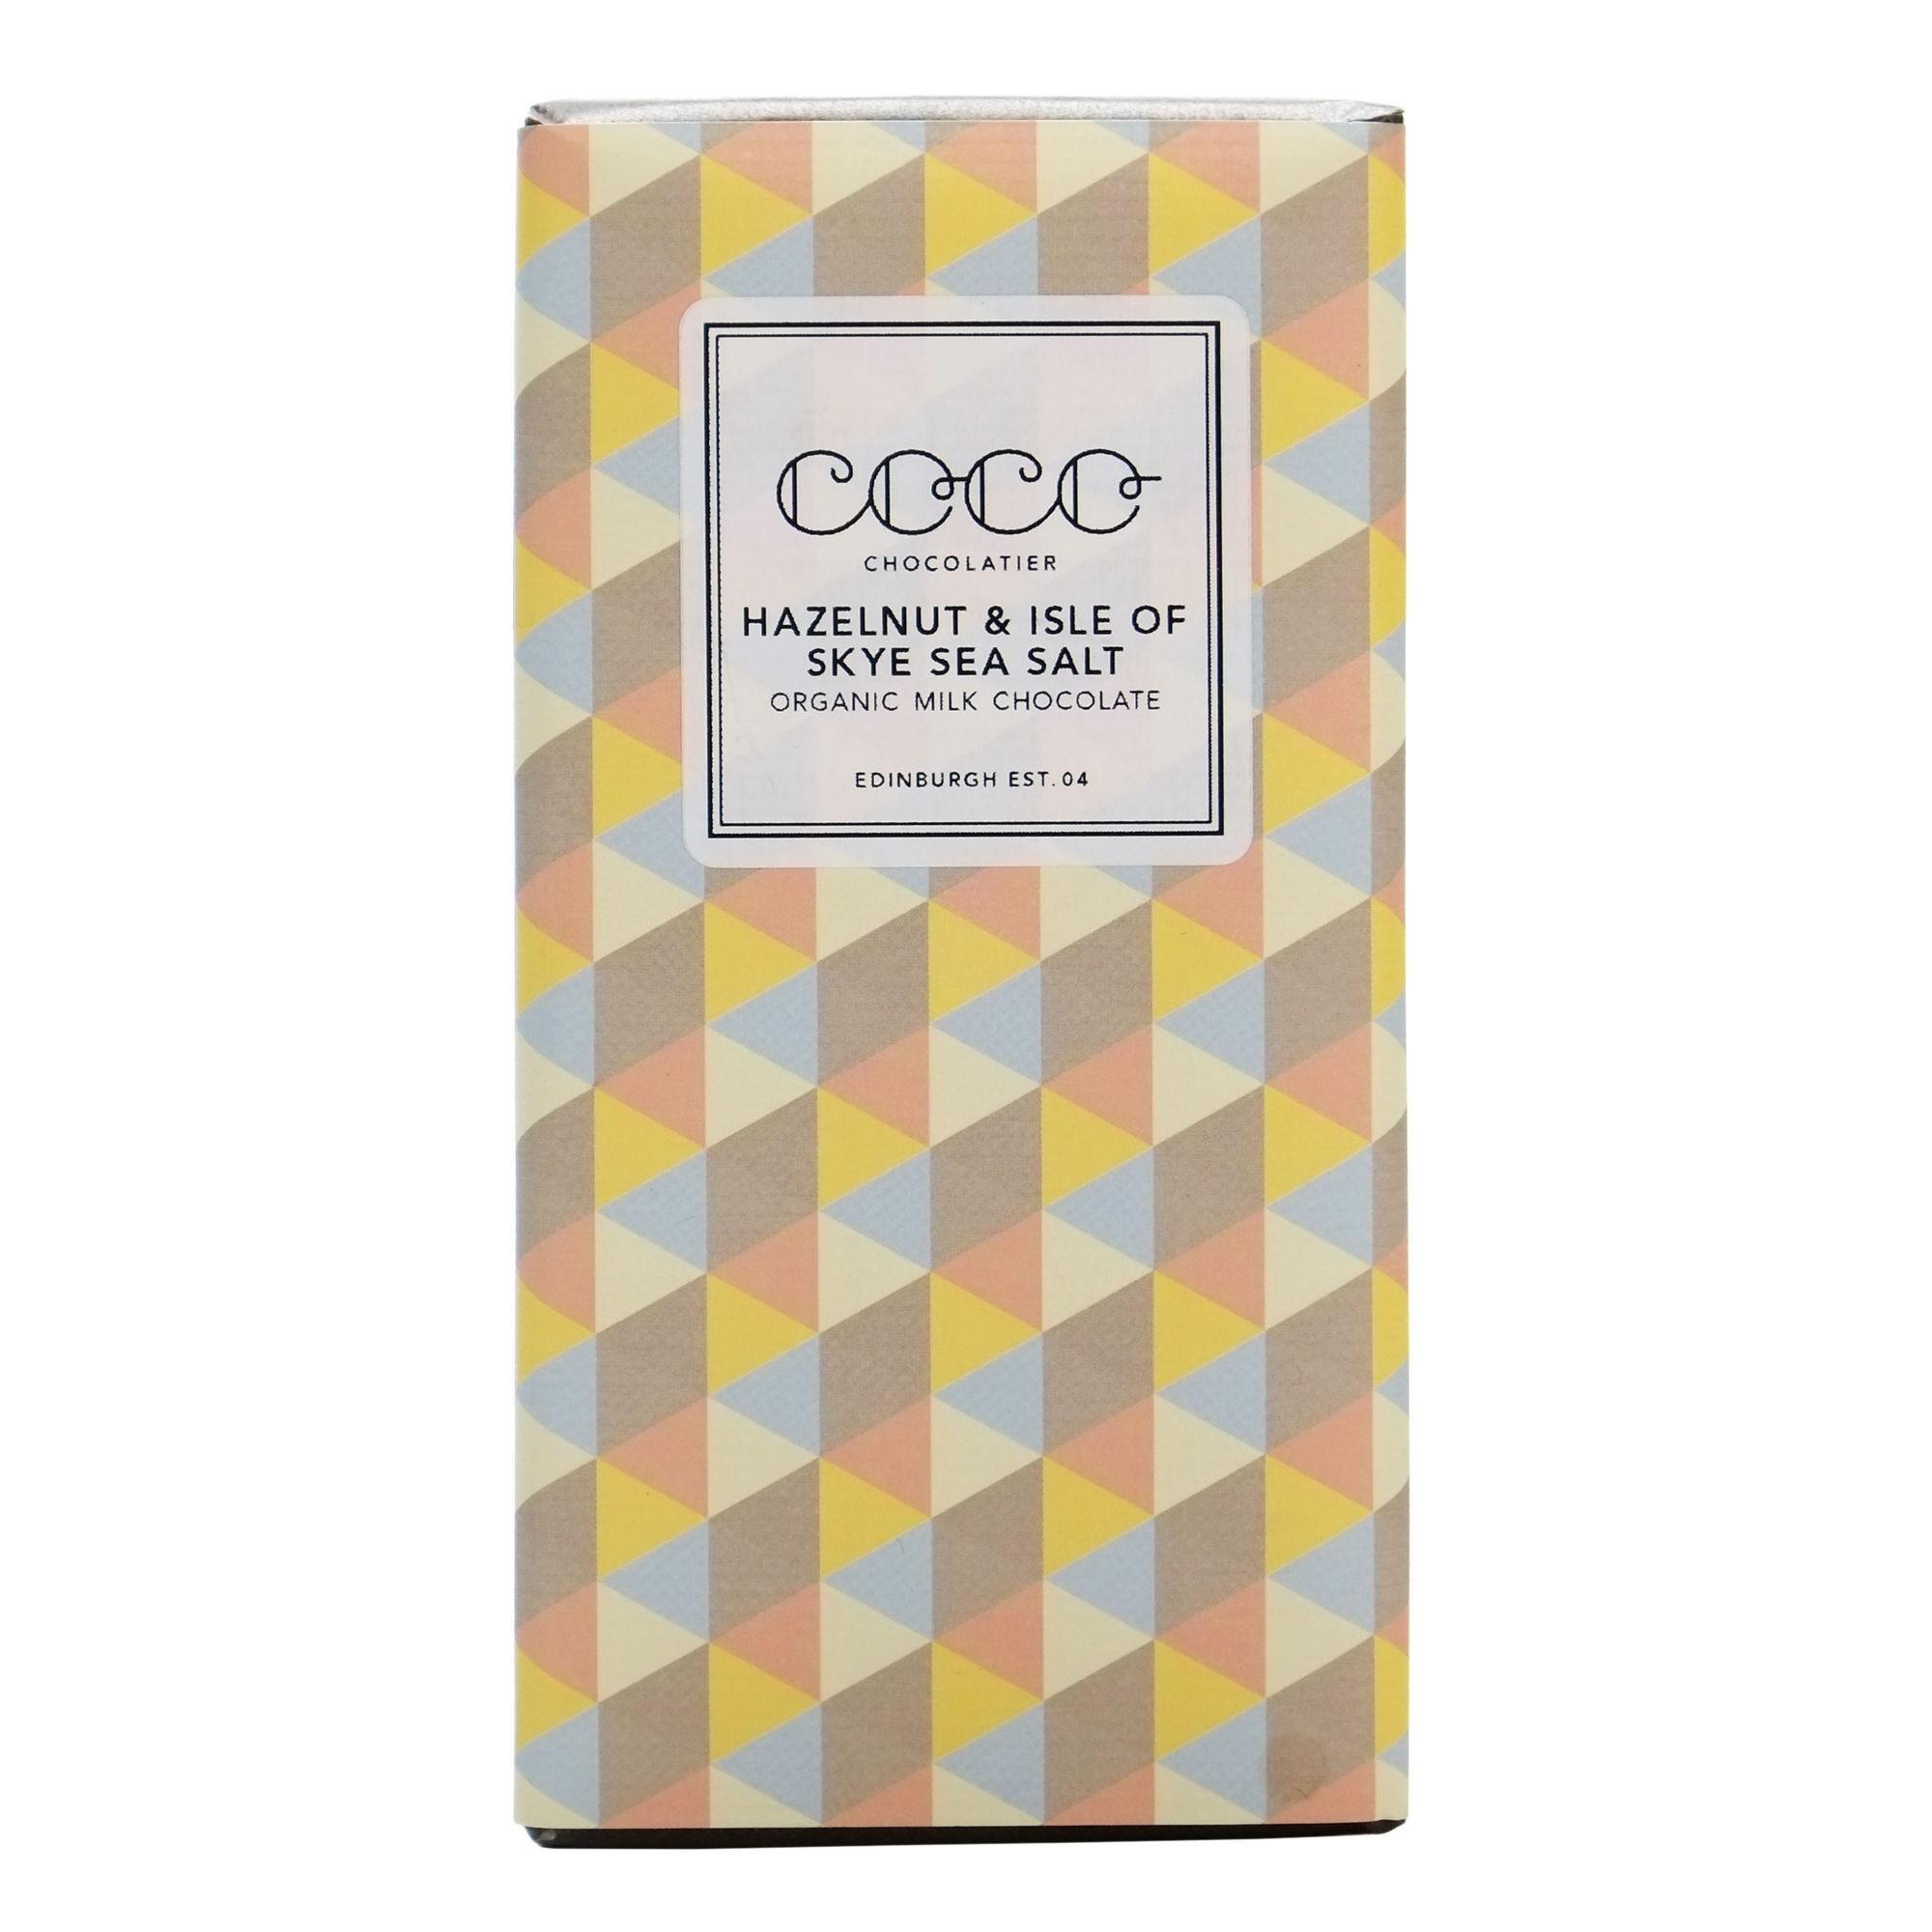 Hazelnut & Isle of Skye Sea Salt Organic Milk Chocolate Bar